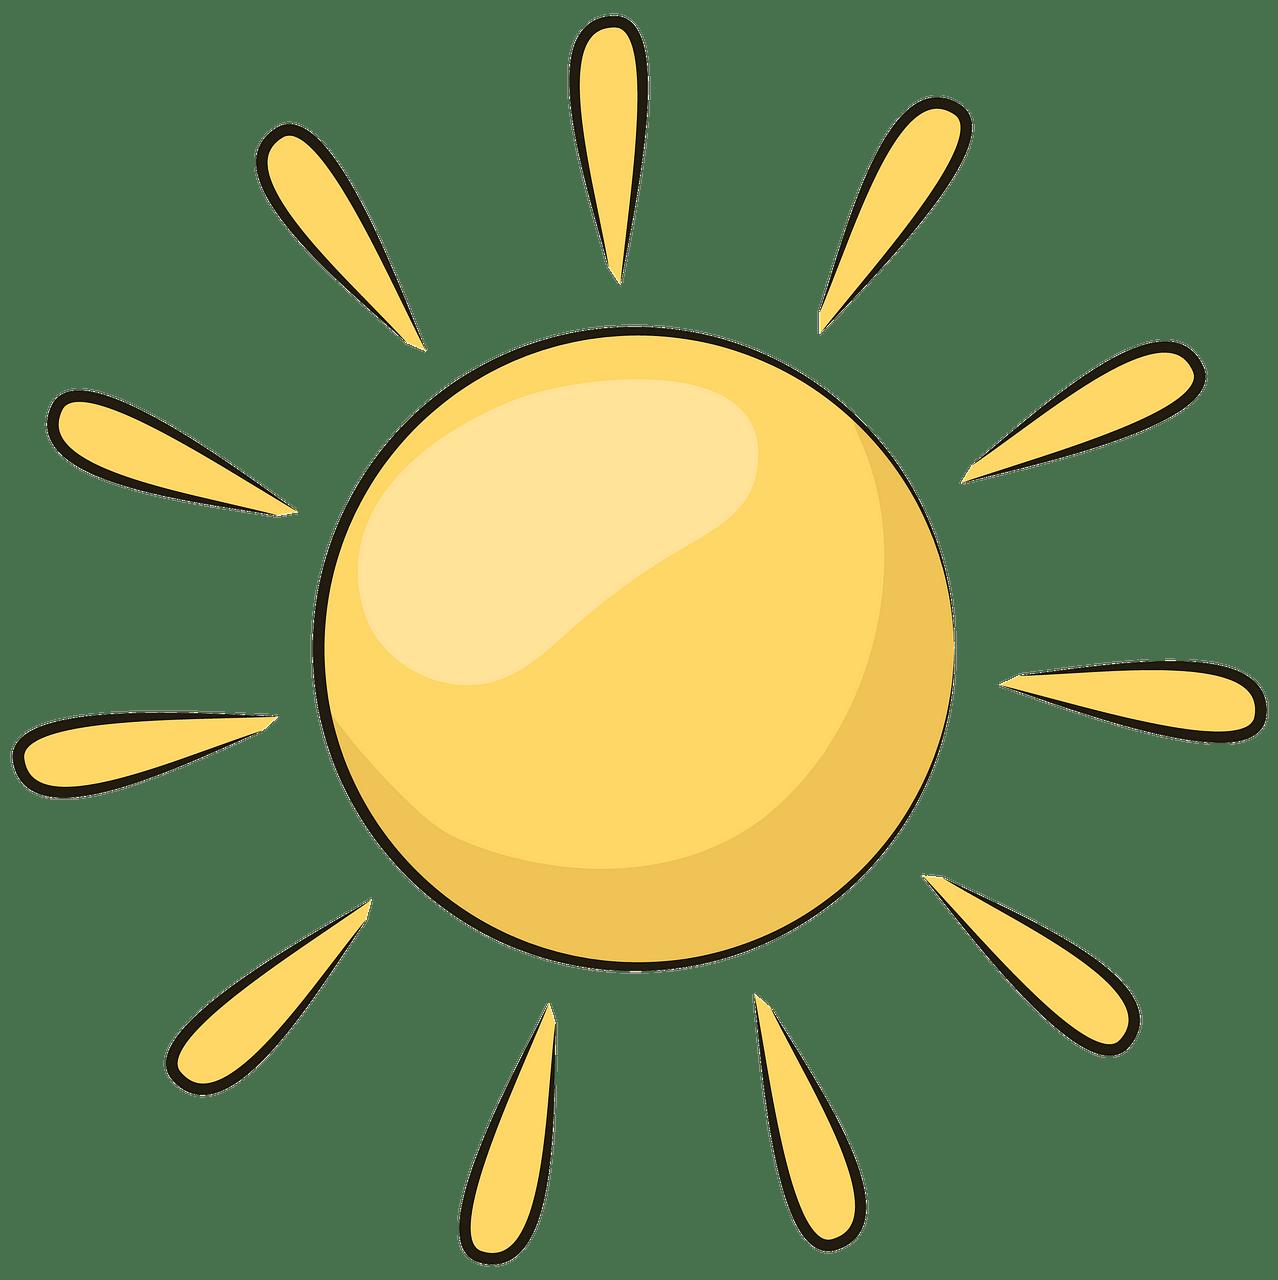 Sun clipart. Free download..